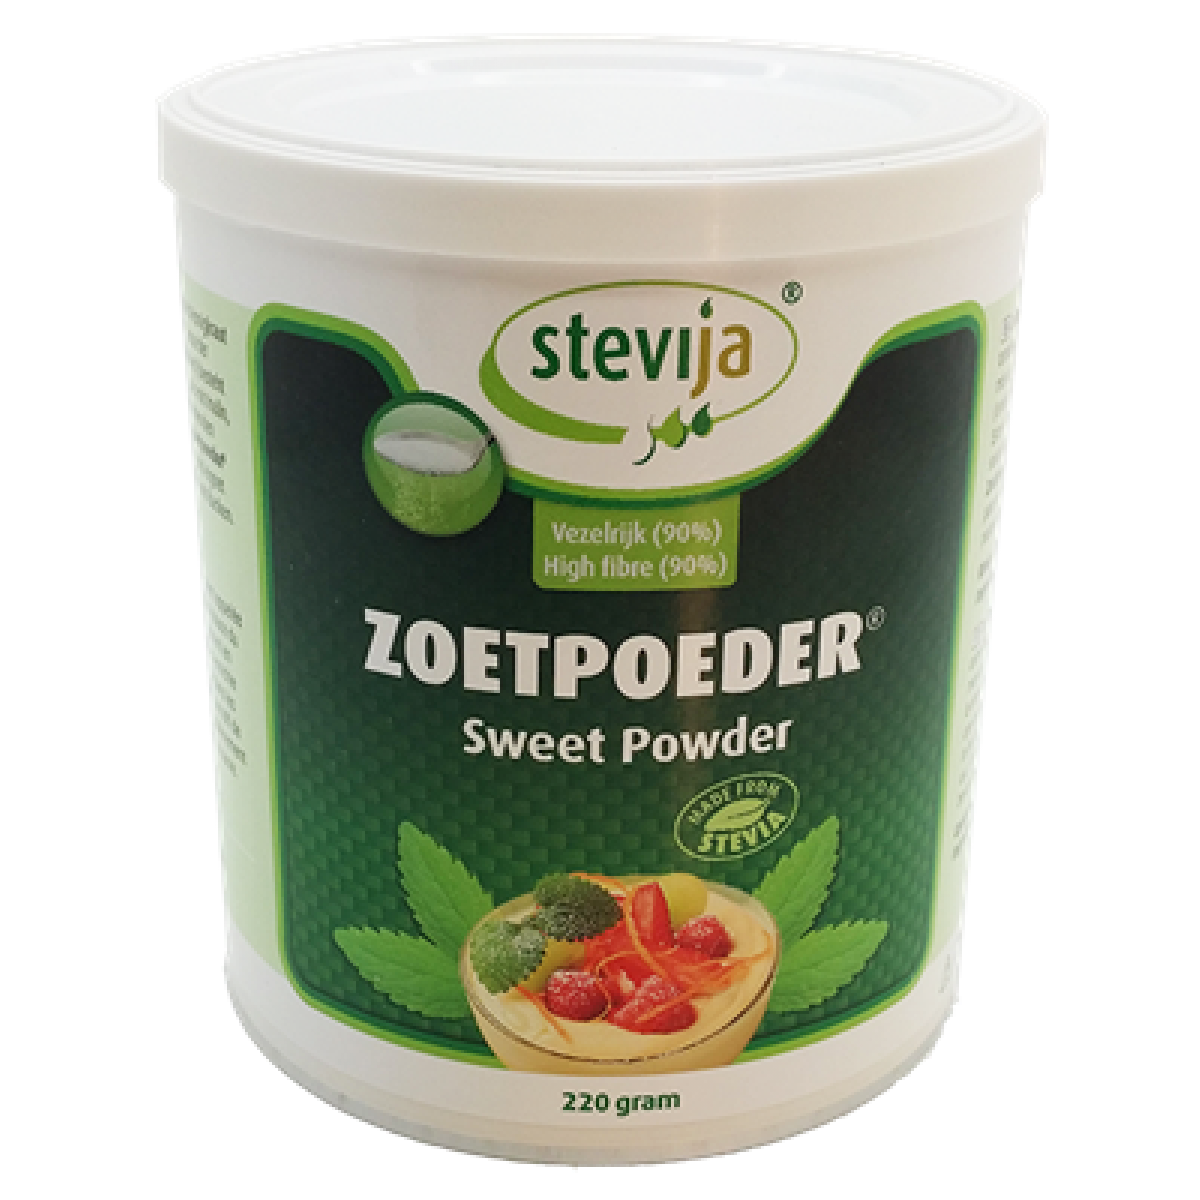 Stevia Zoetpoeder